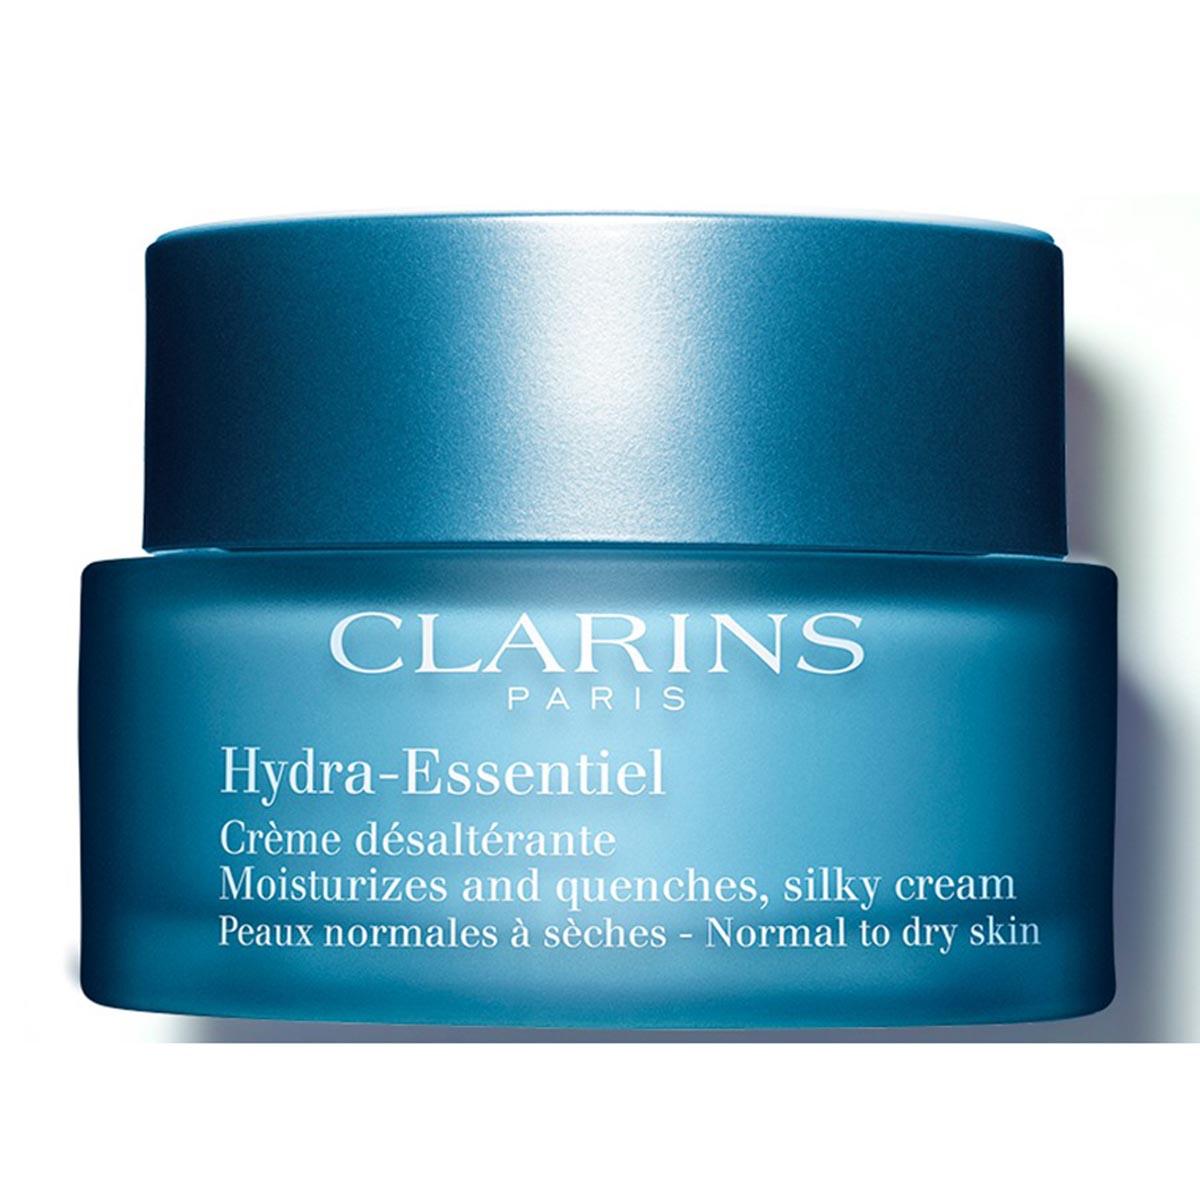 Clarins hydra essentiel creme desalterante peaux normales a seches 50ml